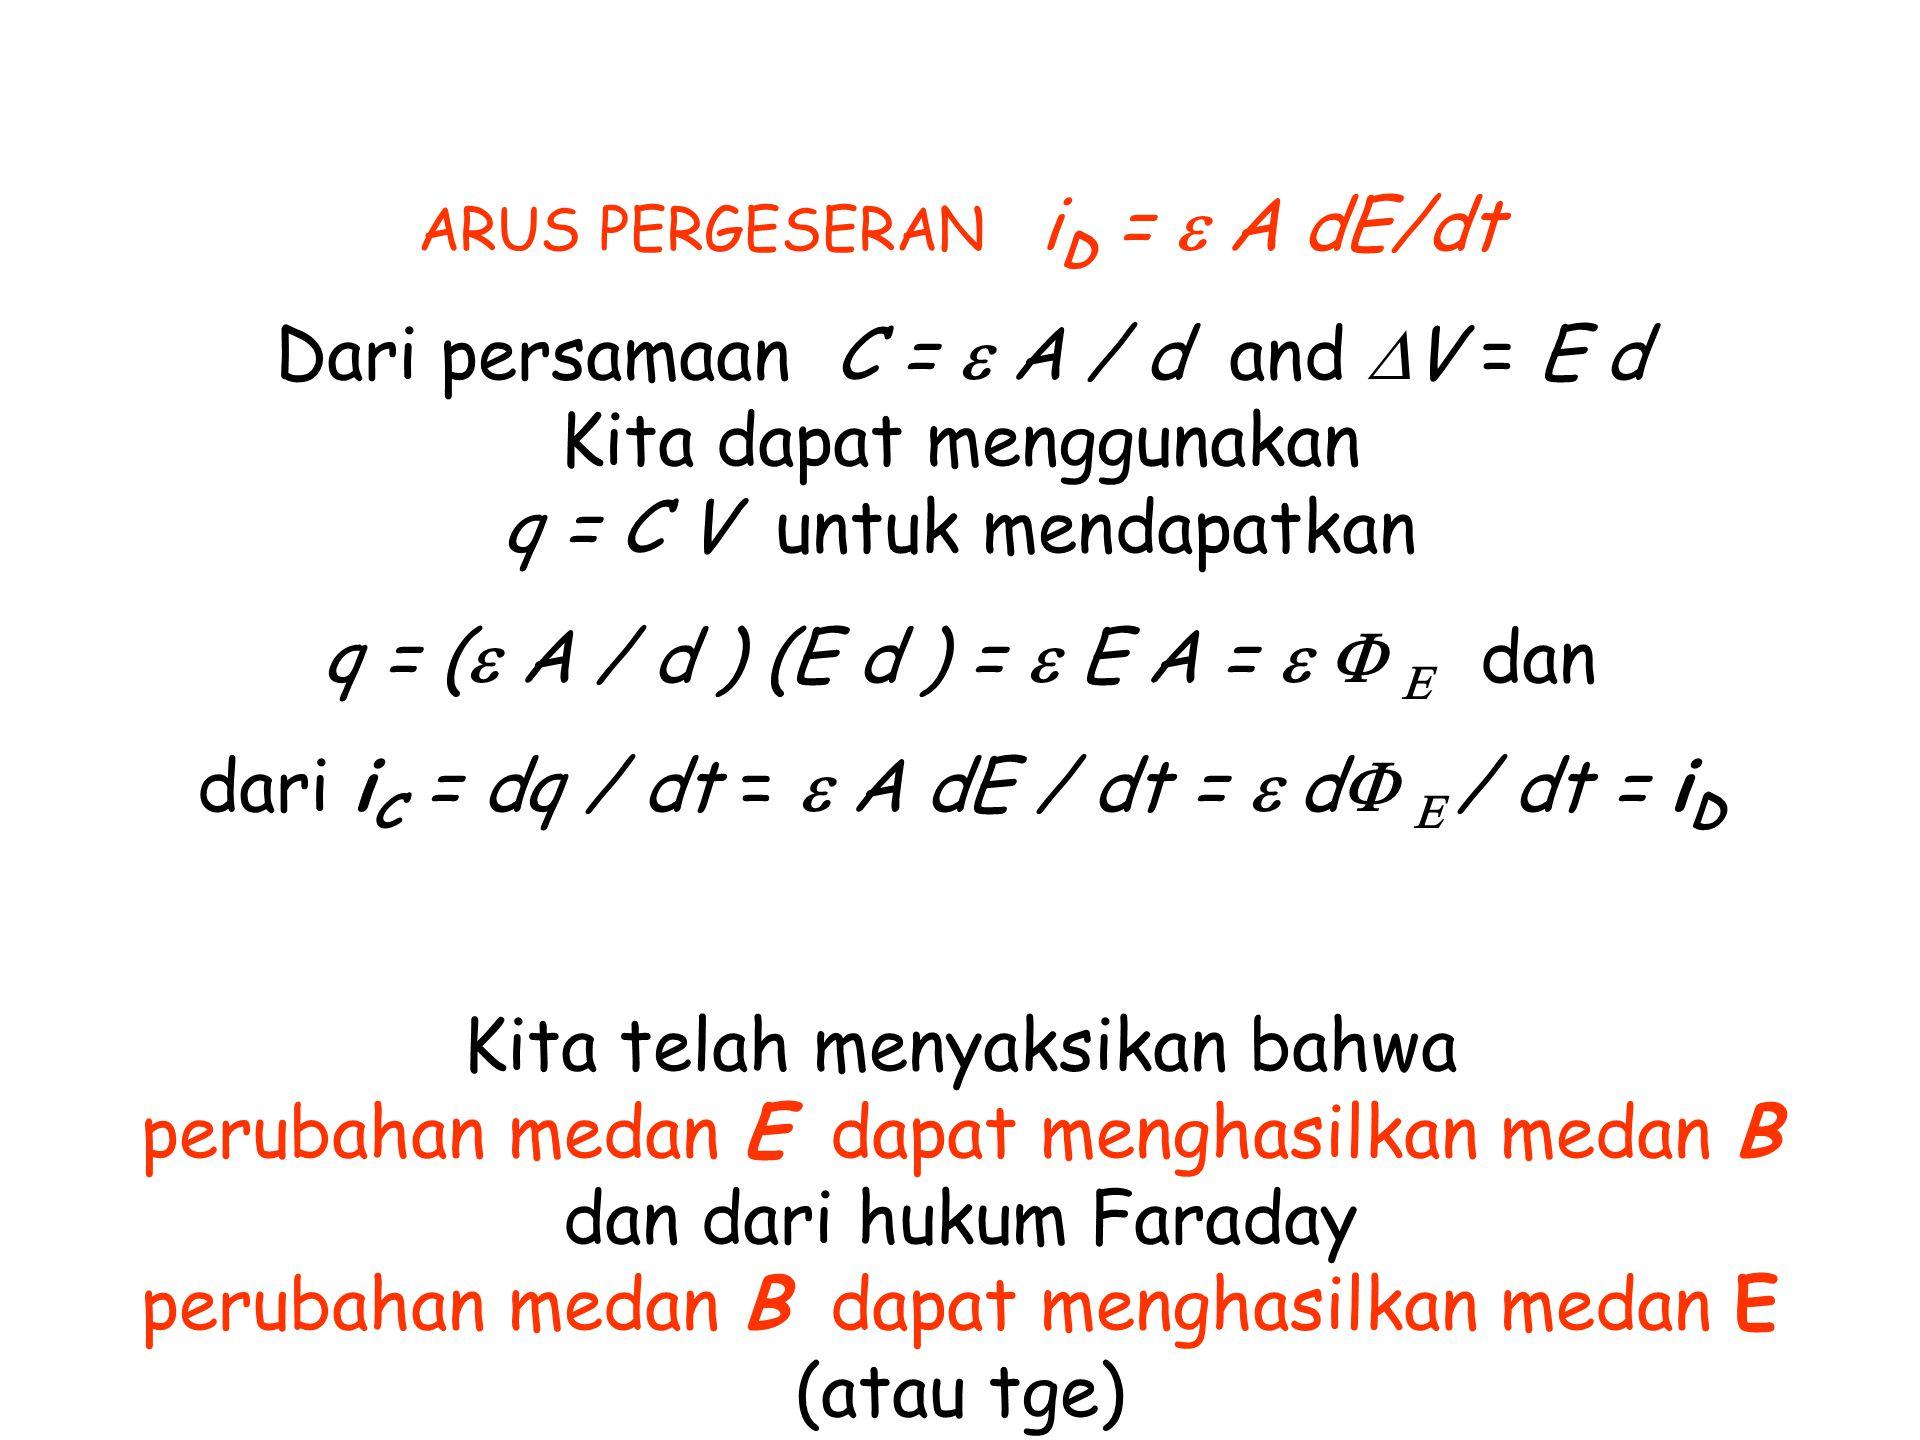 ARUS PERGESERAN i D = e A dE/dt Dari persamaan C = e A / d and D V = E d Kita dapat menggunakan q = C V untuk mendapatkan q = ( e A / d ) (E d ) = e E A = e F E dan dari i C = dq / dt = e A dE / dt = e d F E / dt = i D Kita telah menyaksikan bahwa perubahan medan E dapat menghasilkan medan B dan dari hukum Faraday perubahan medan B dapat menghasilkan medan E (atau tge)